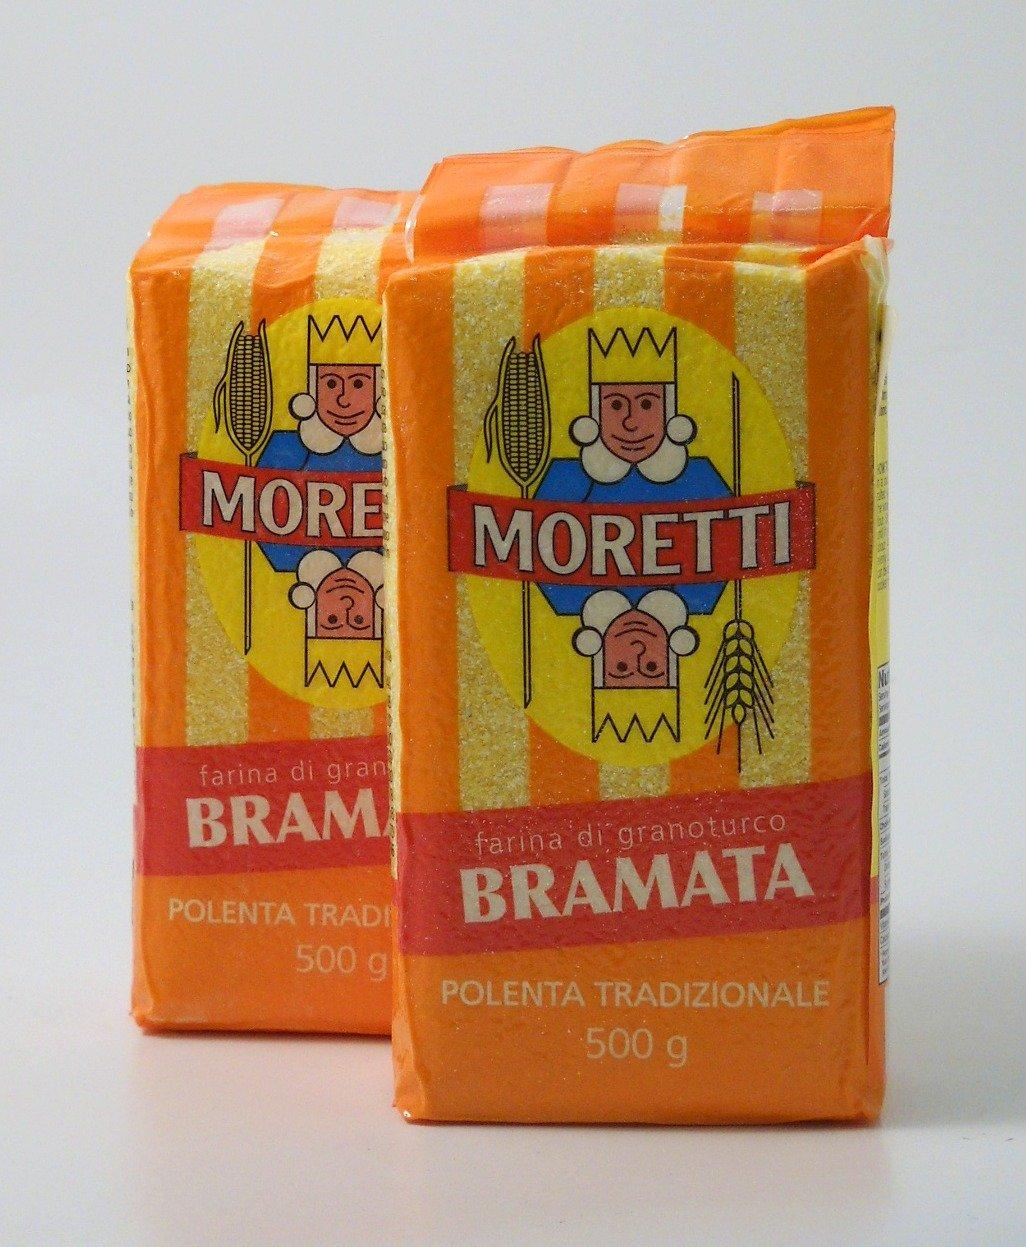 Moretti Bramata Polenta (2 bags) - 1.1 Pounds each